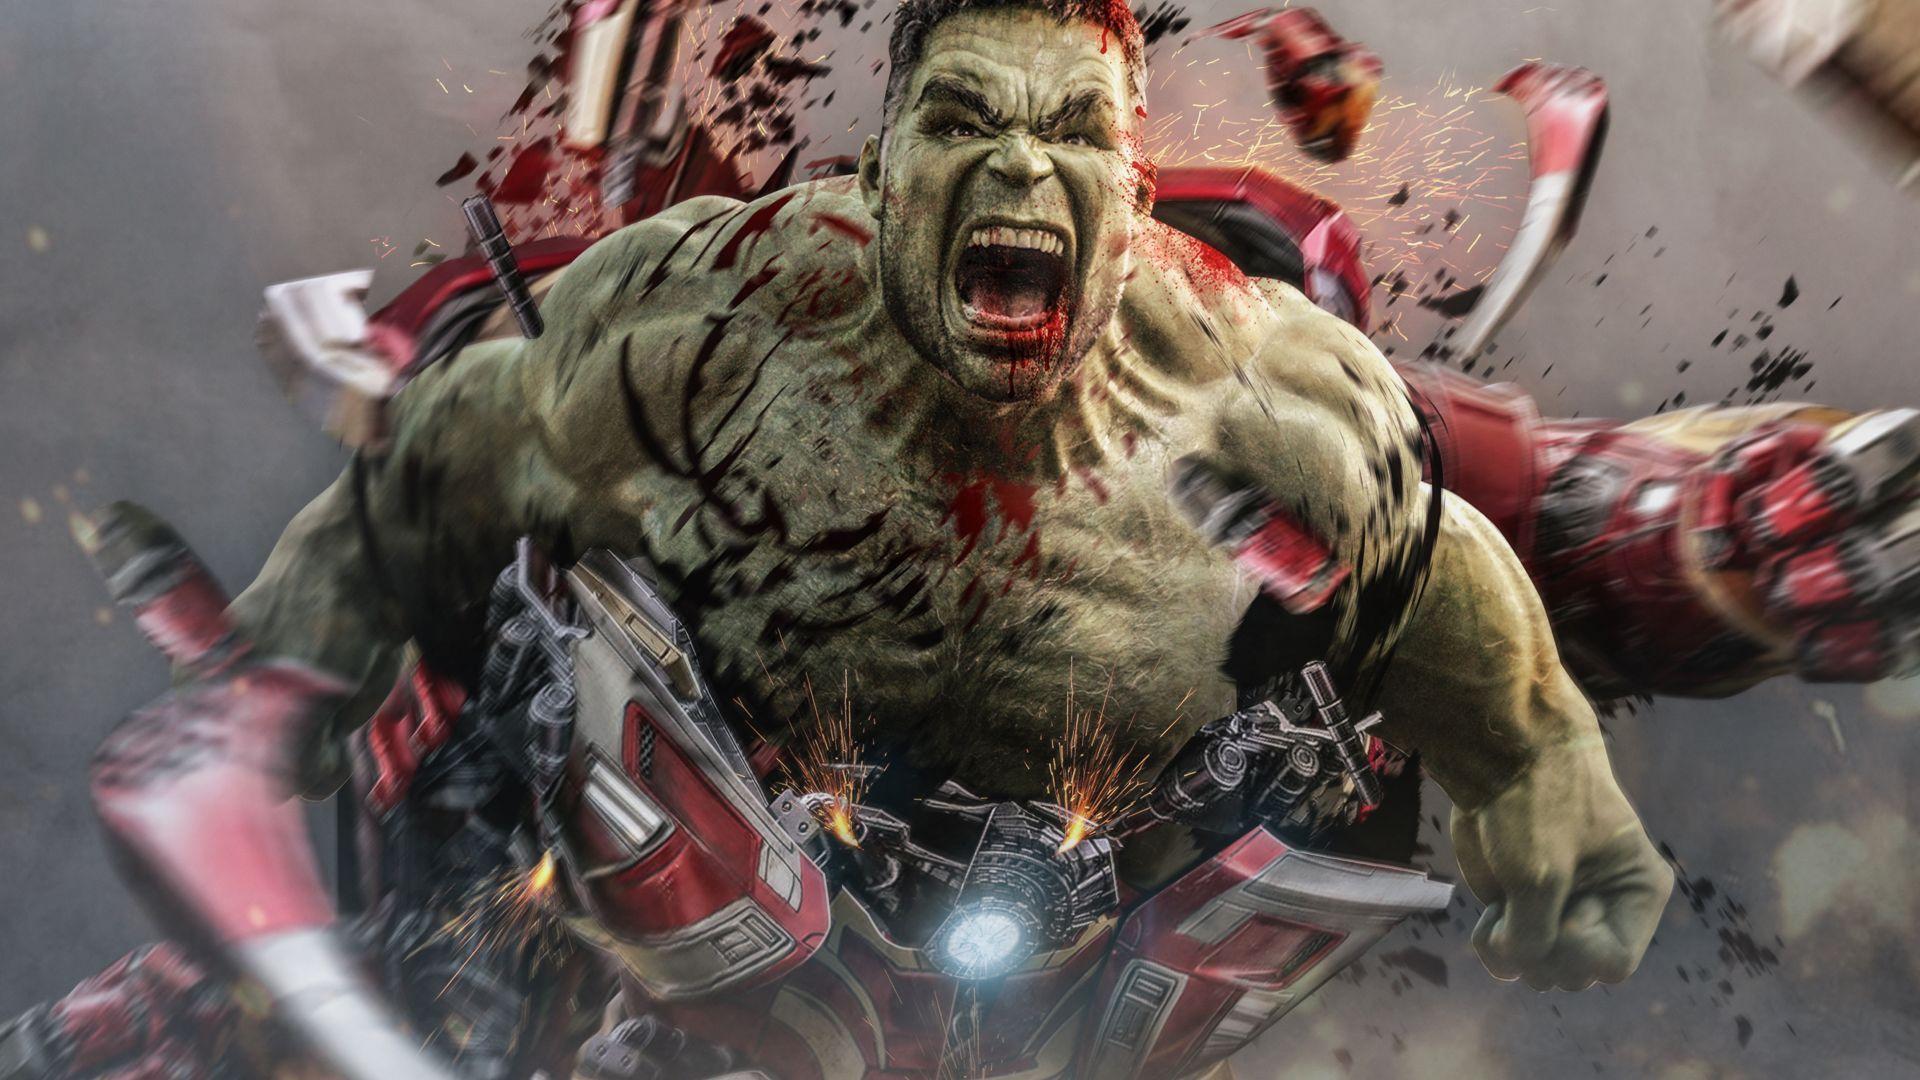 Smart Hulk bursts out from hulk buster, a concept art